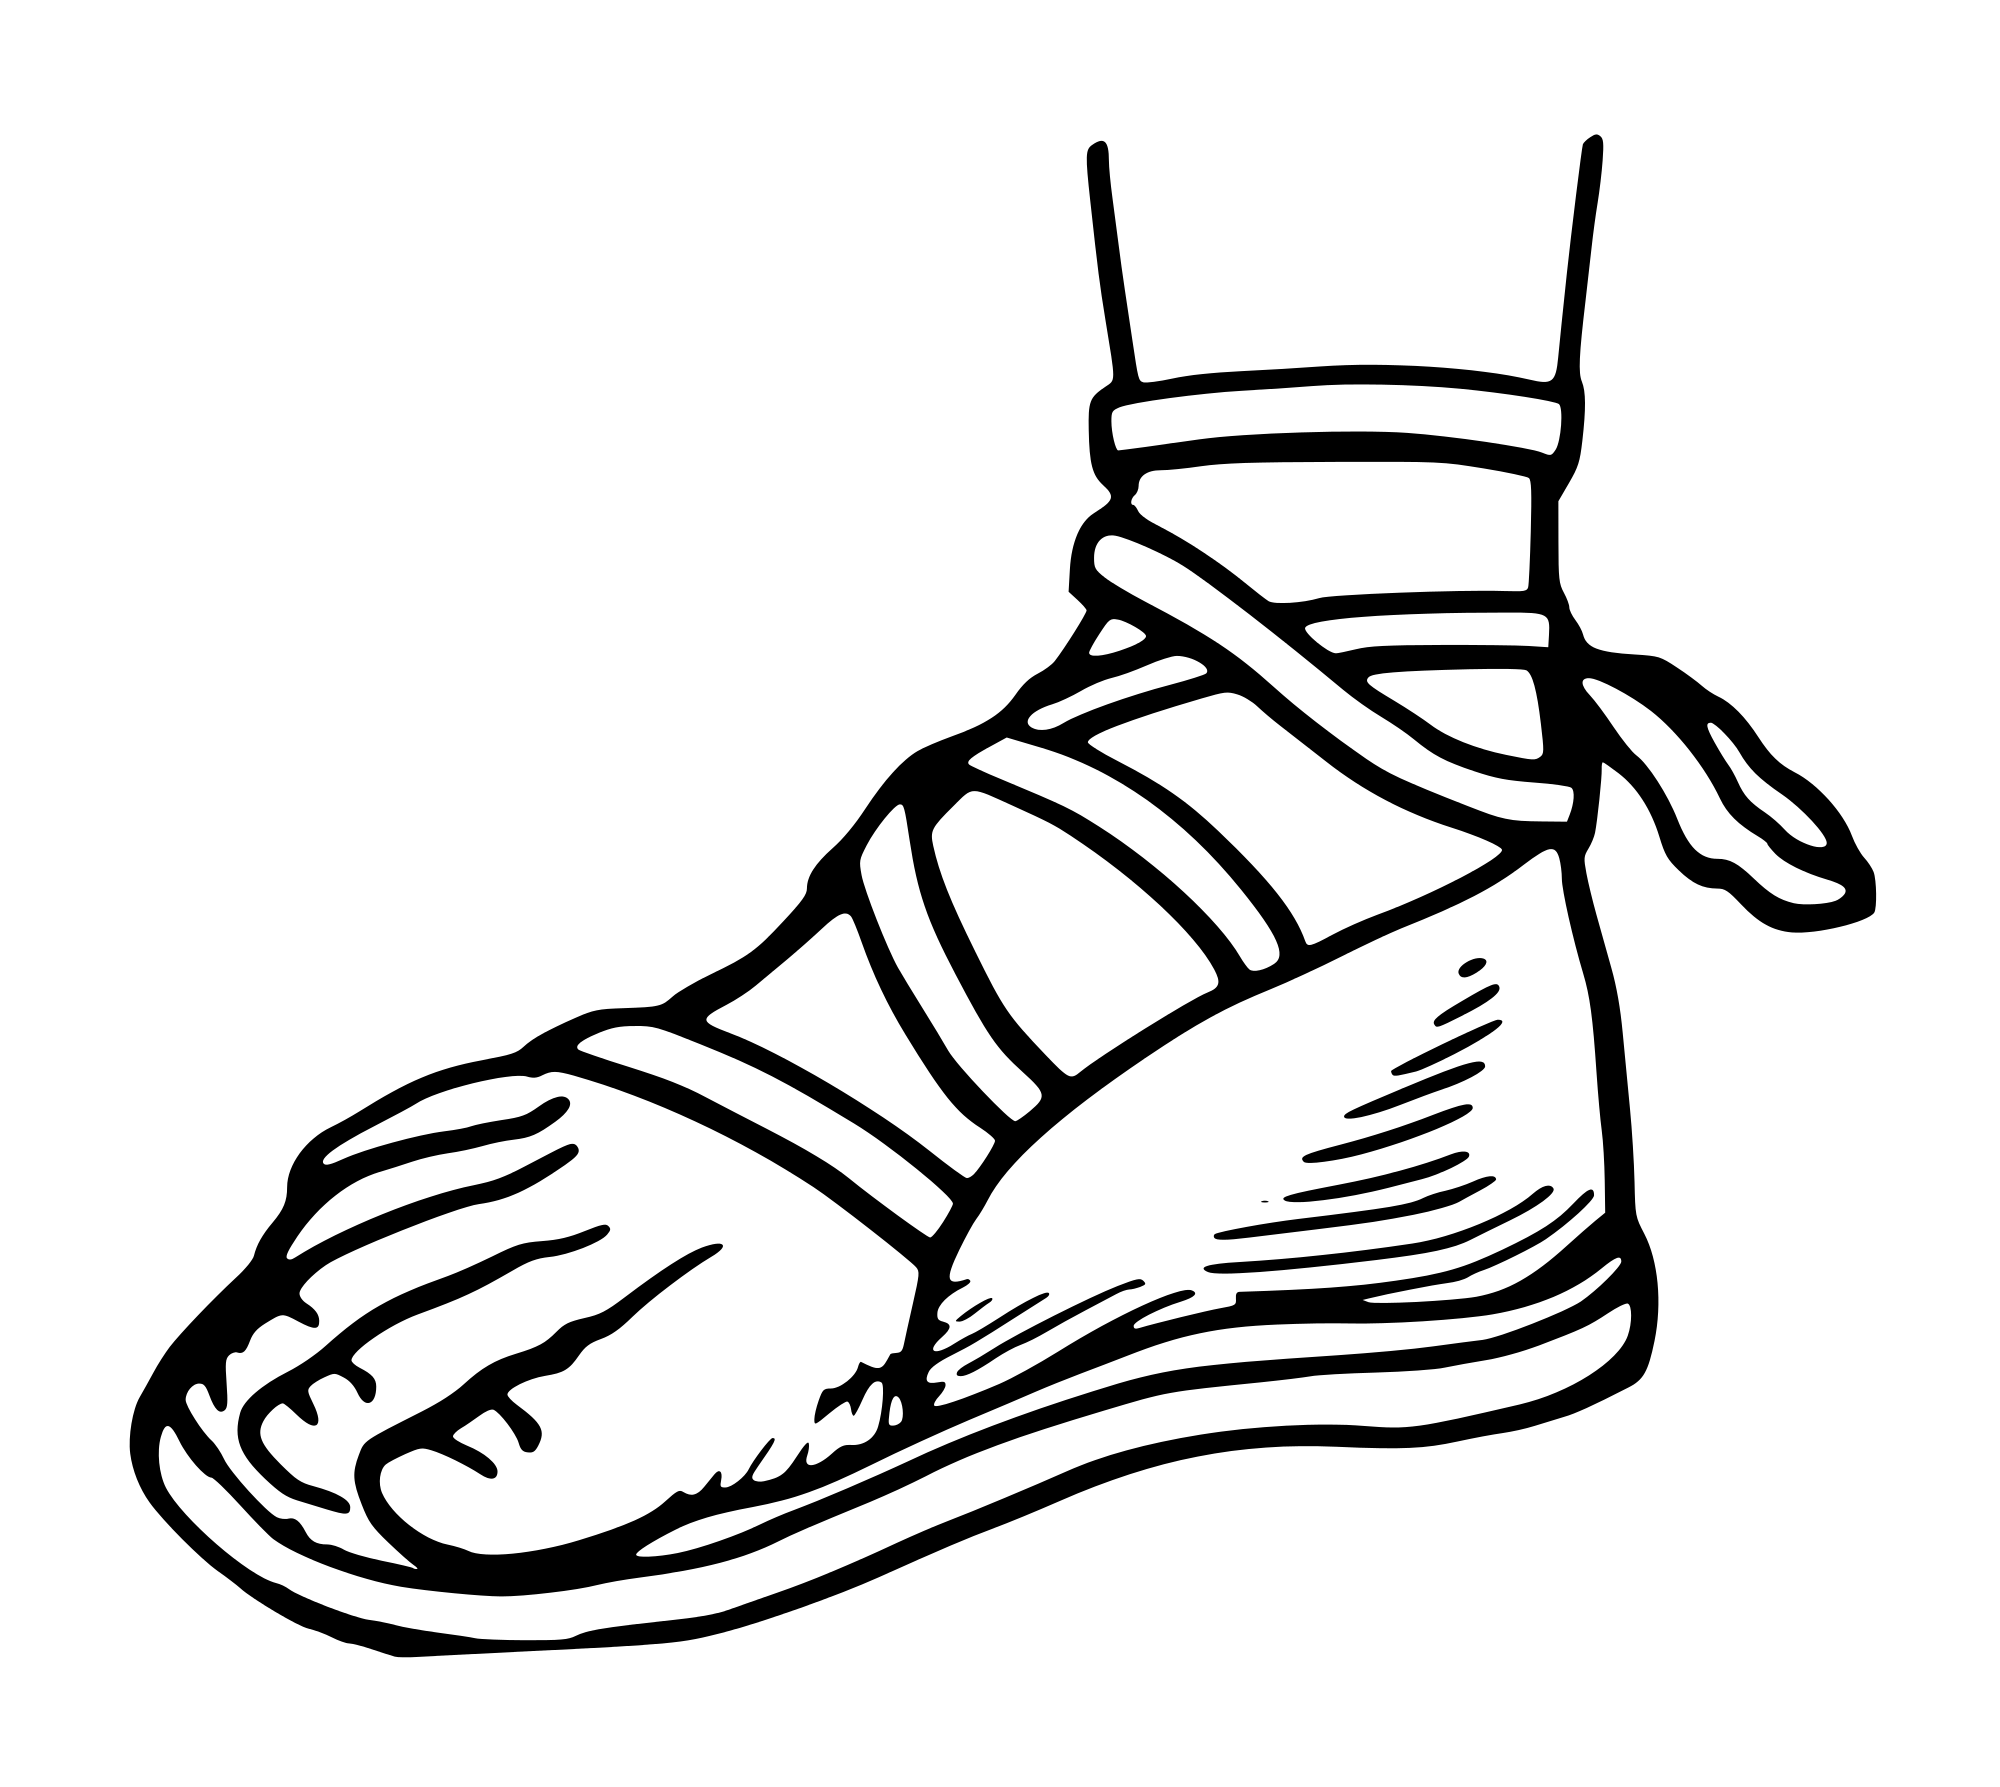 2000x1787 Filesandal 2 (Psf).svg